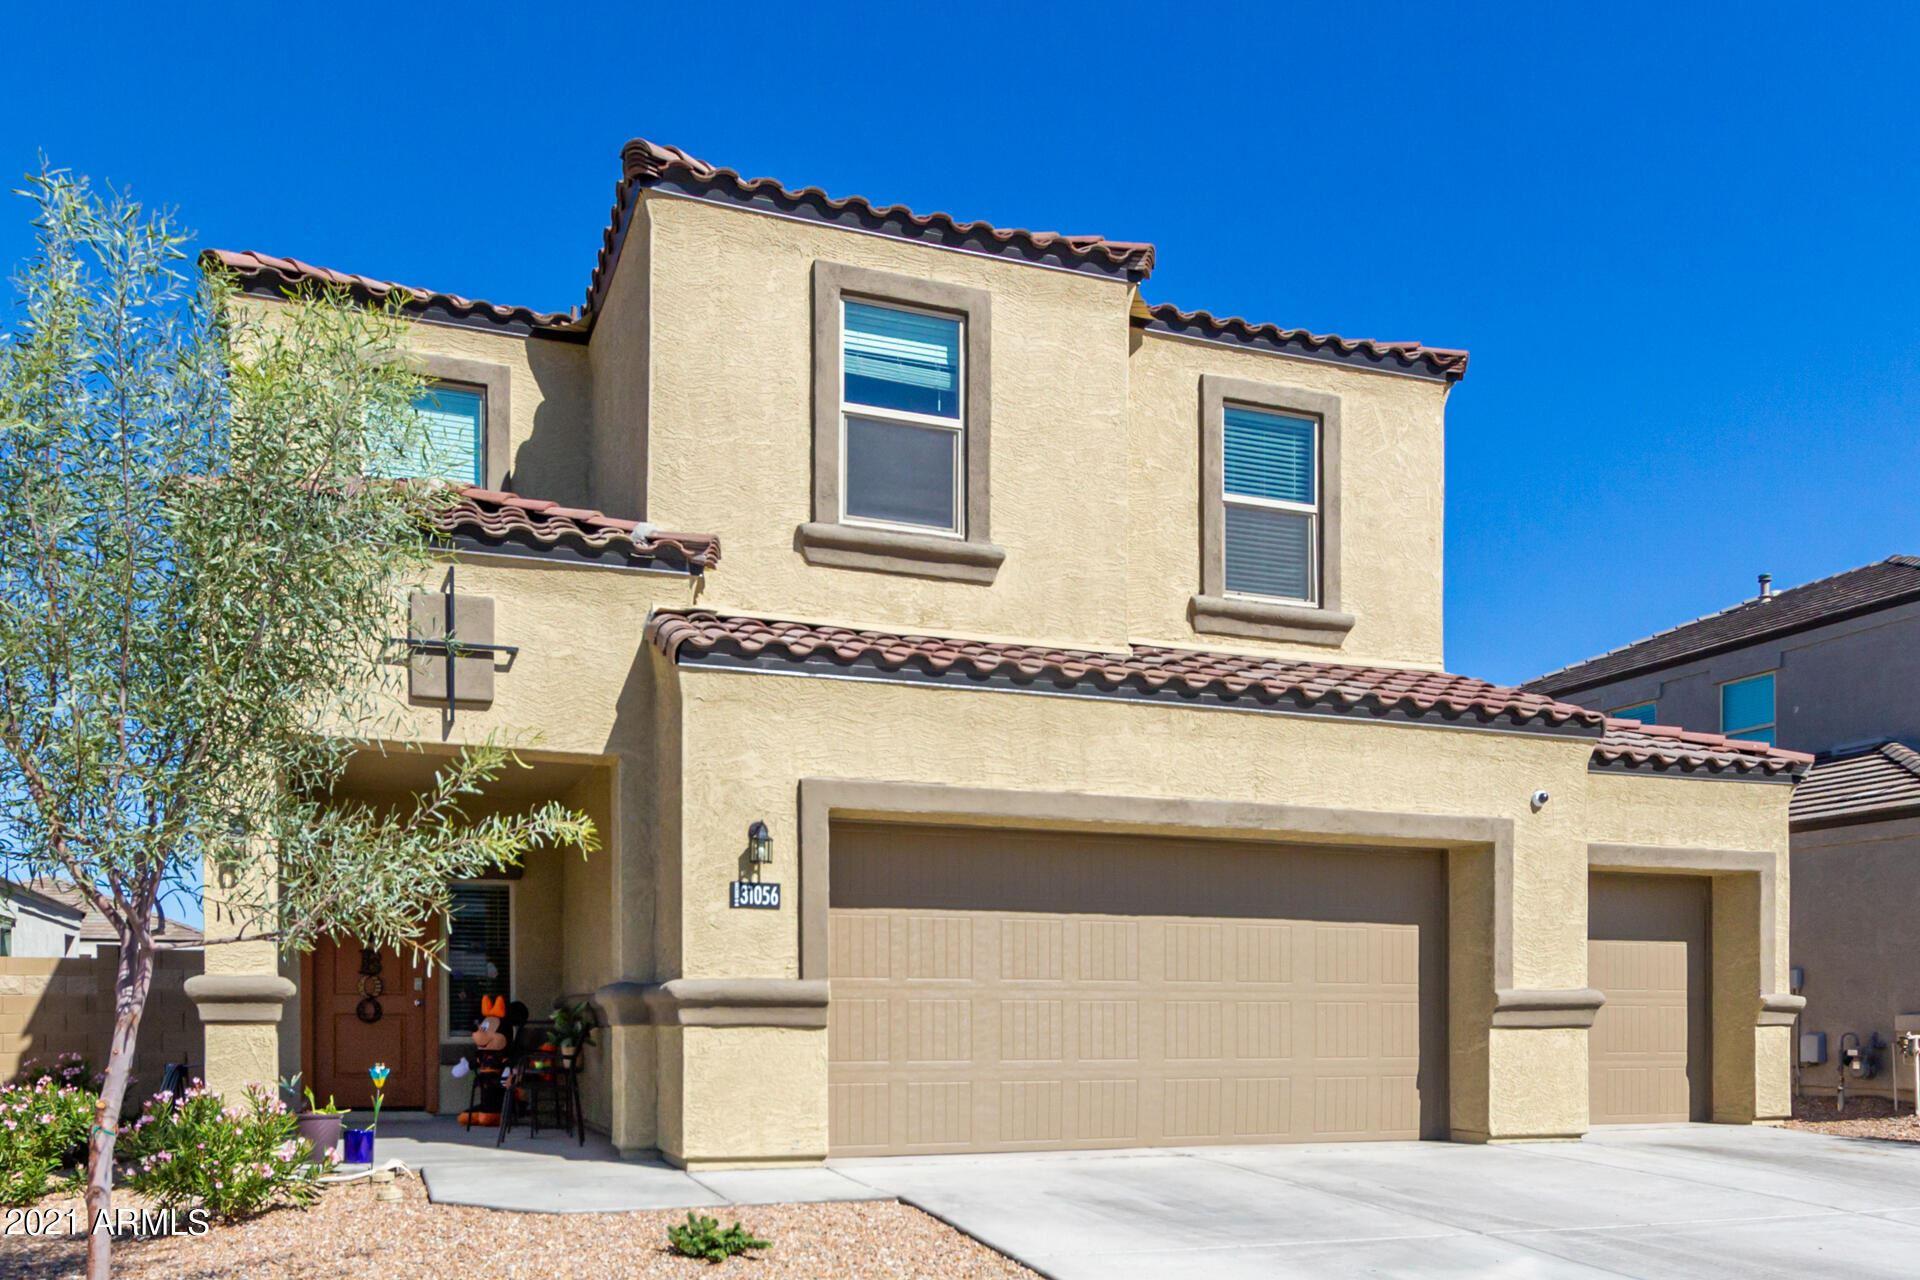 Photo of 31056 W Cheery Lynn Road, Buckeye, AZ 85396 (MLS # 6307704)